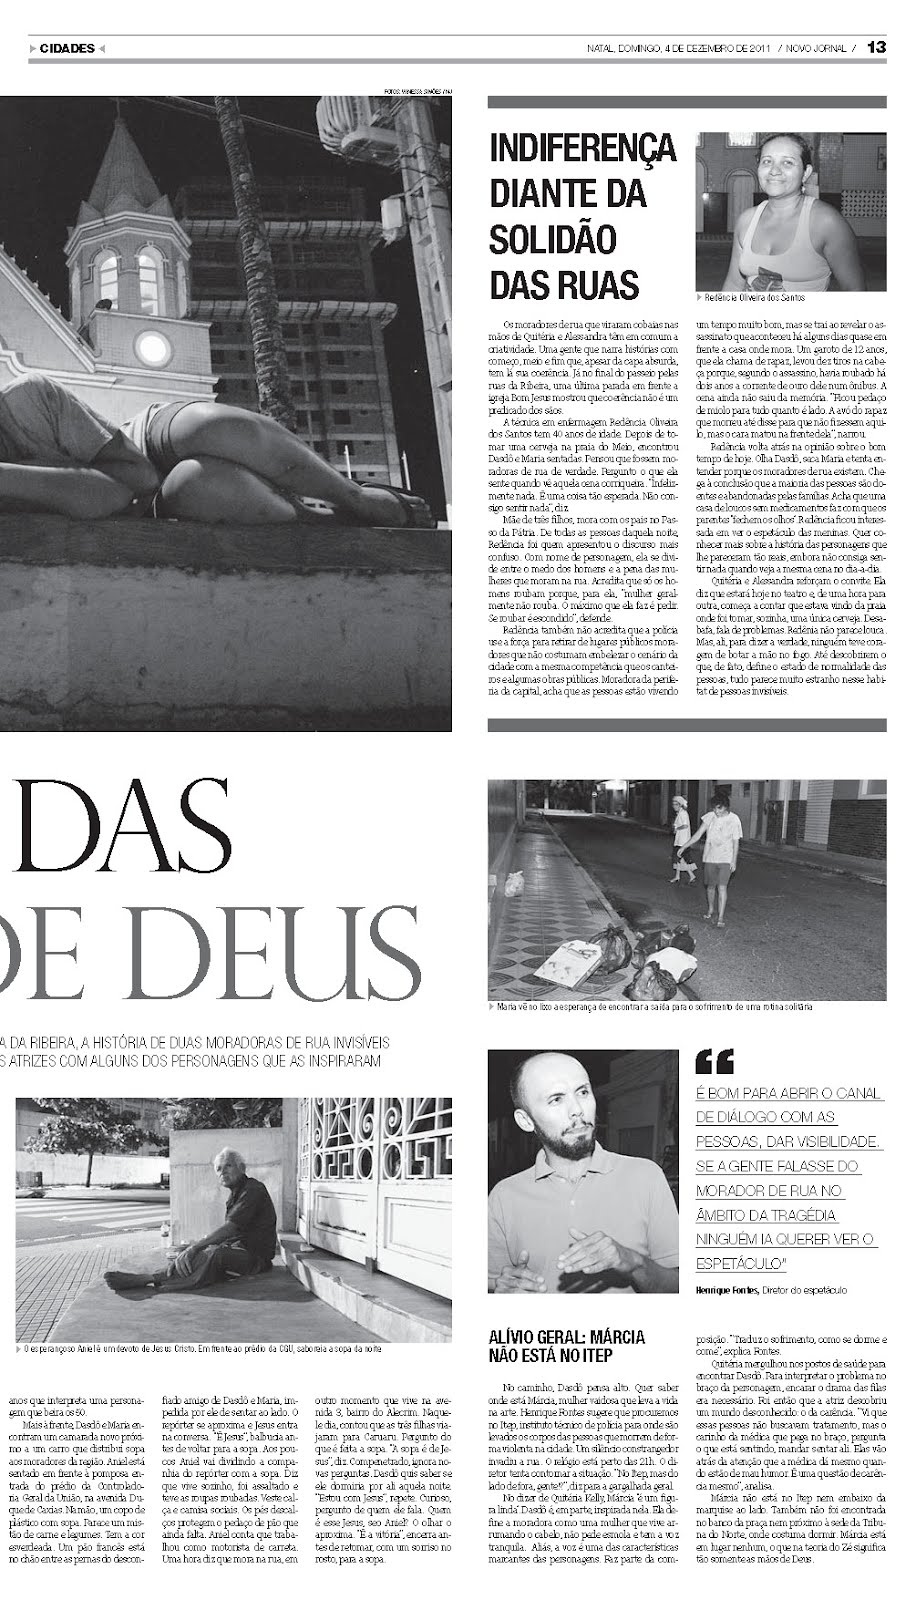 www.novojornal.jor.br_publicadas_Dezembro_2011_04-12-2011_Caderno_02_Page_2.jpg